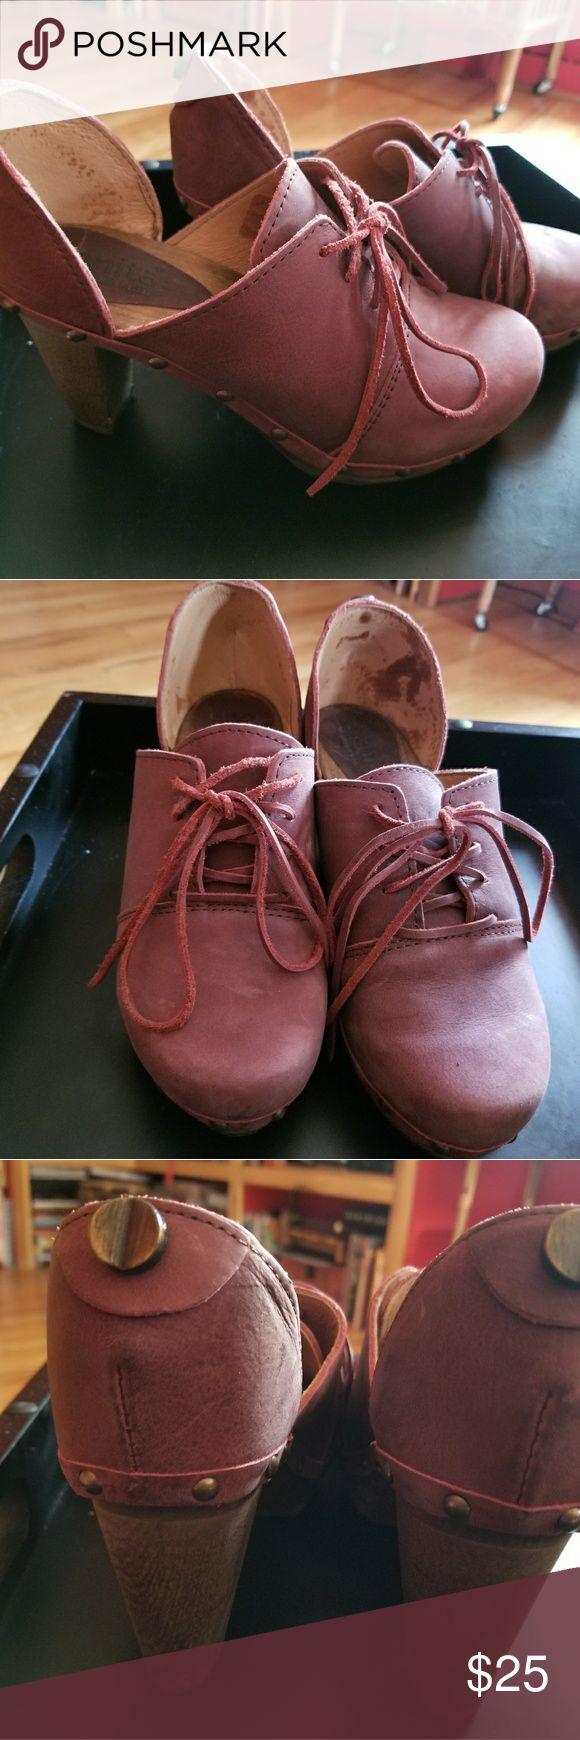 Sanita Clogs Chunky heeled wooden platform booties Wine colored cordovan Sanita Clogs Chunky heeled wooden platform booties Sanita Shoes Mules & Clogs